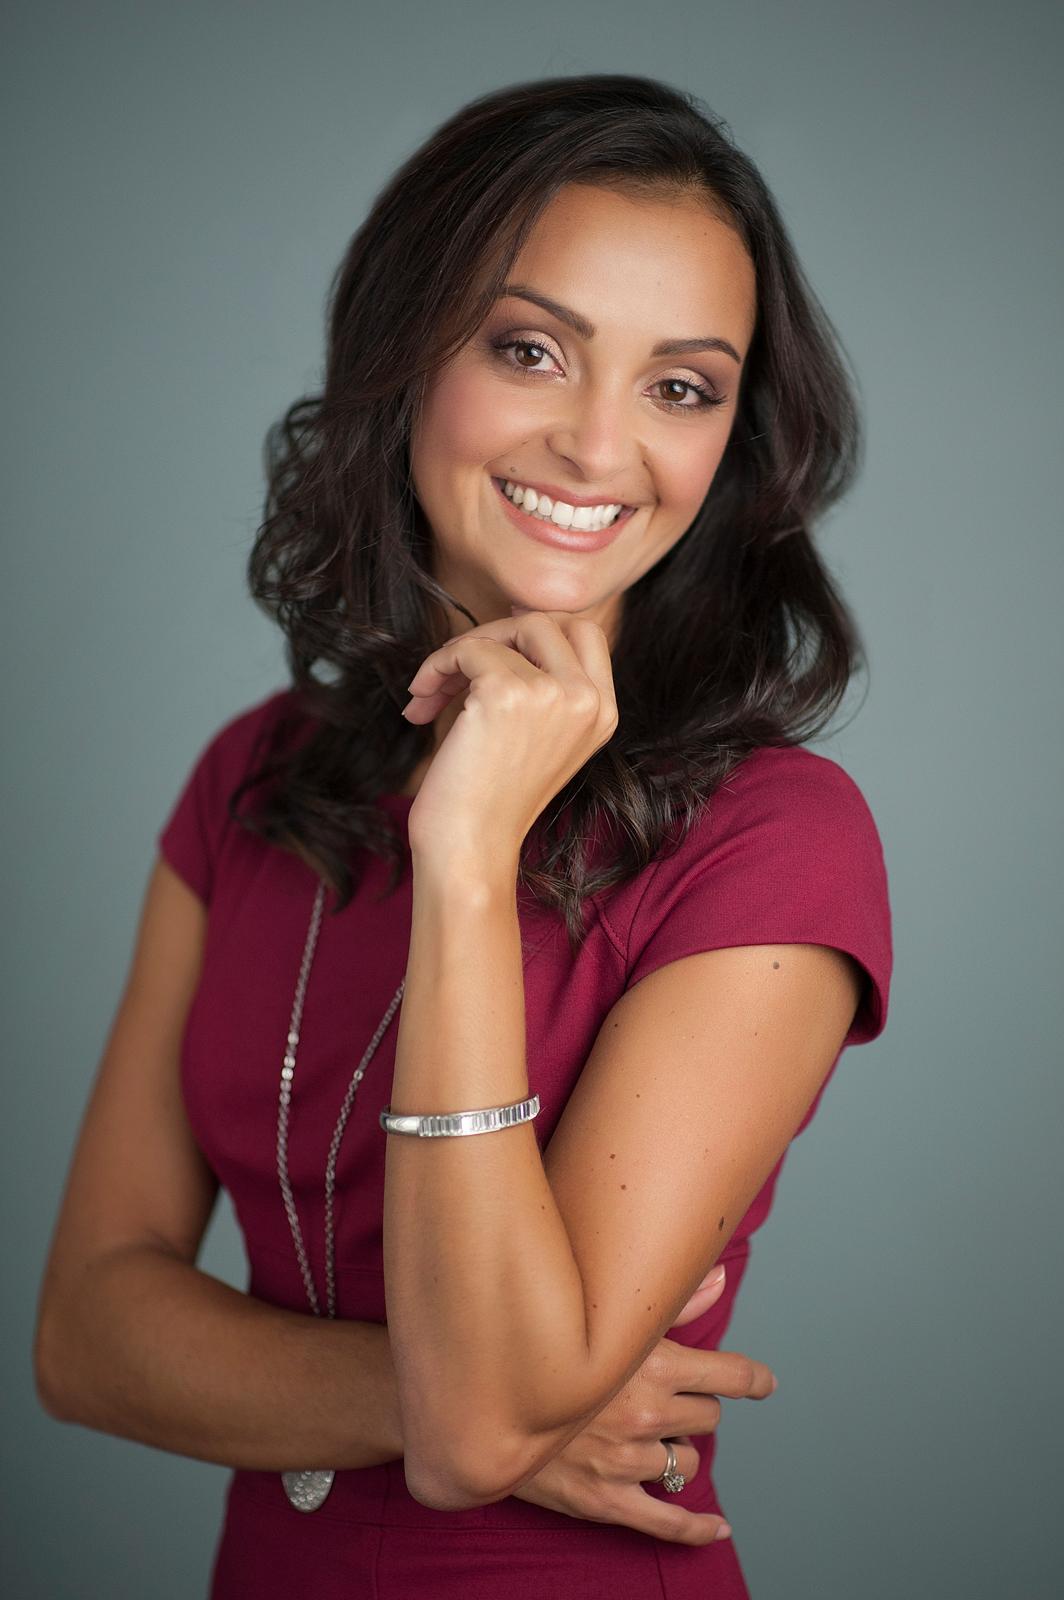 39-professional-woman-friendly-pose-business-headshot.jpg